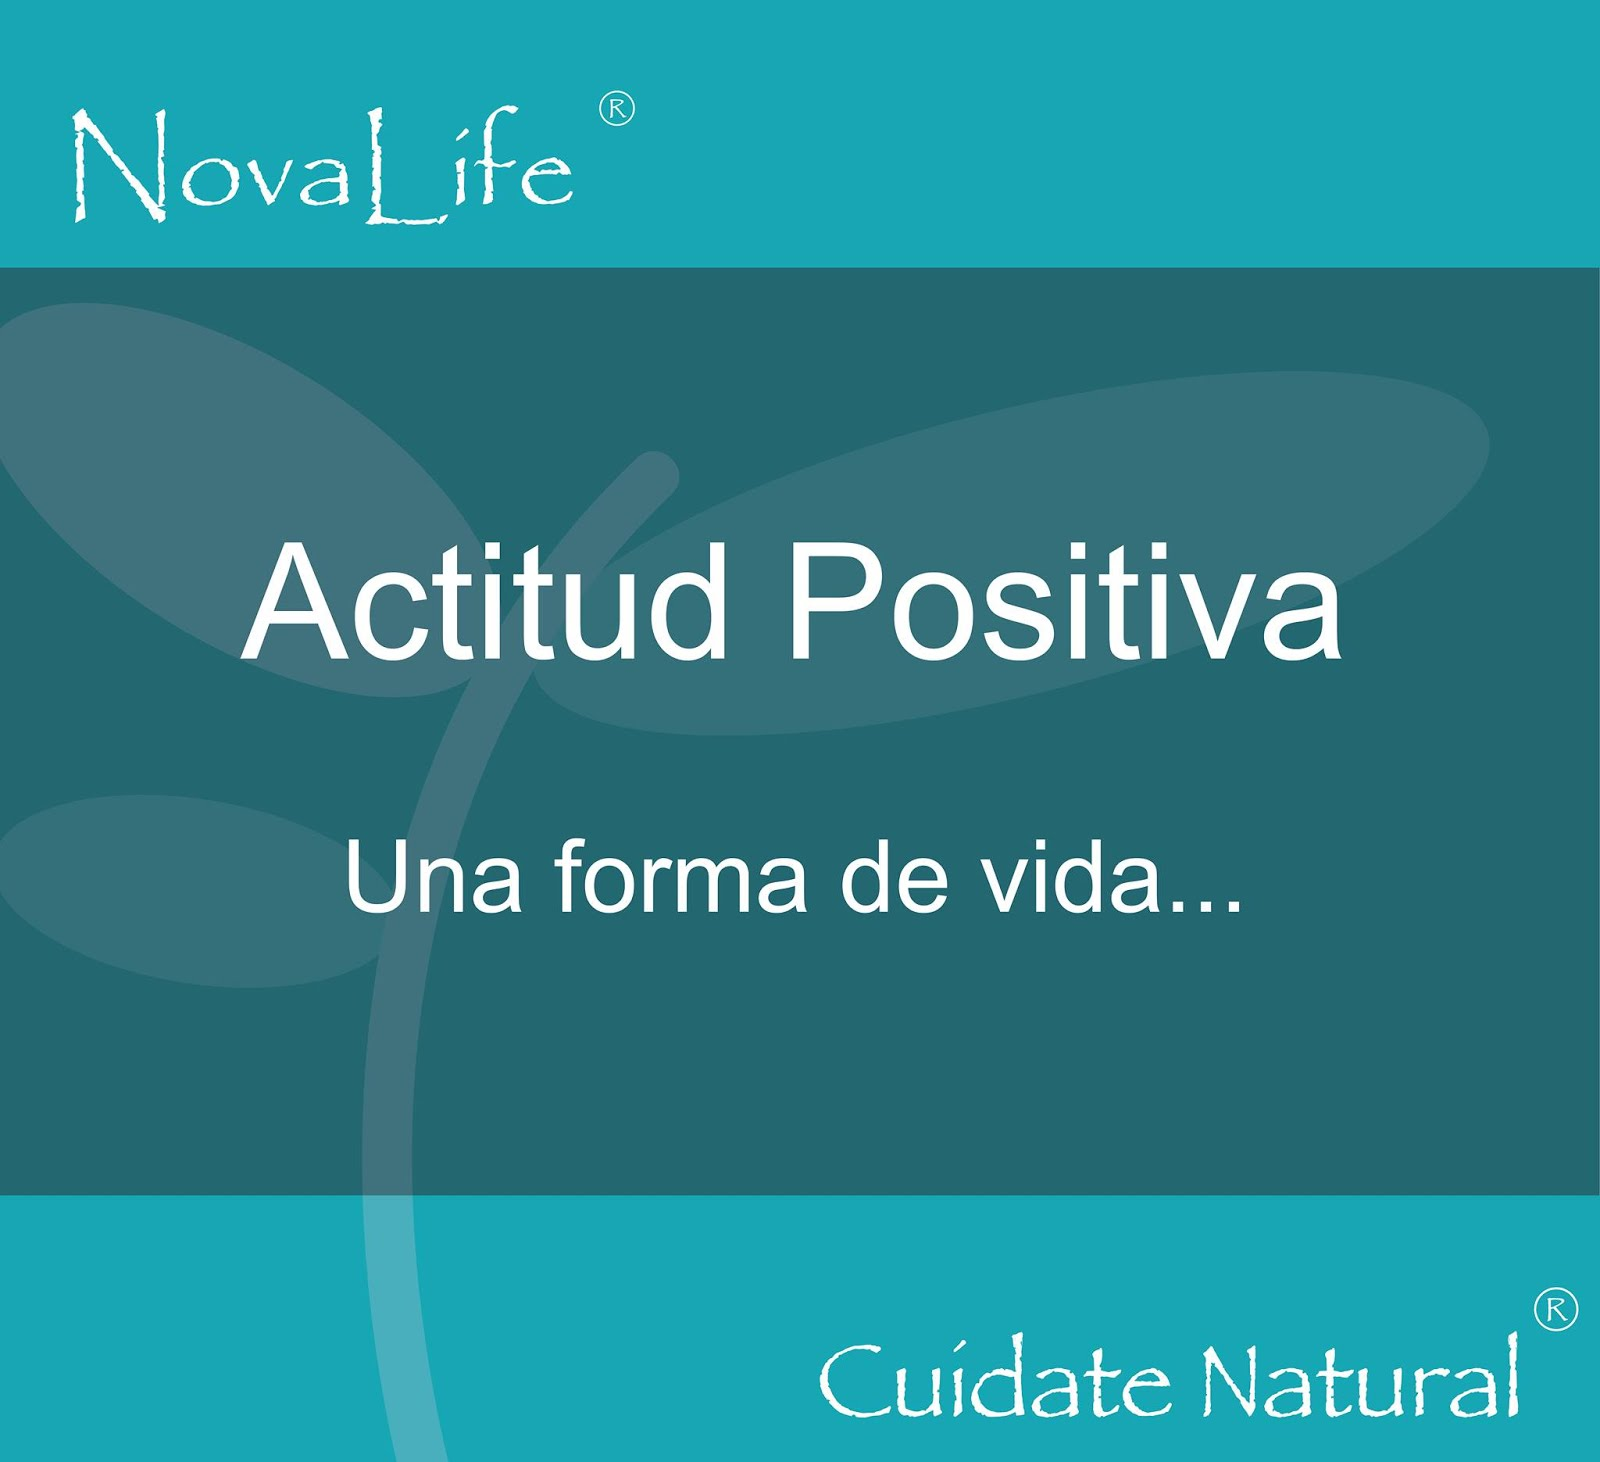 Nova Life Sport